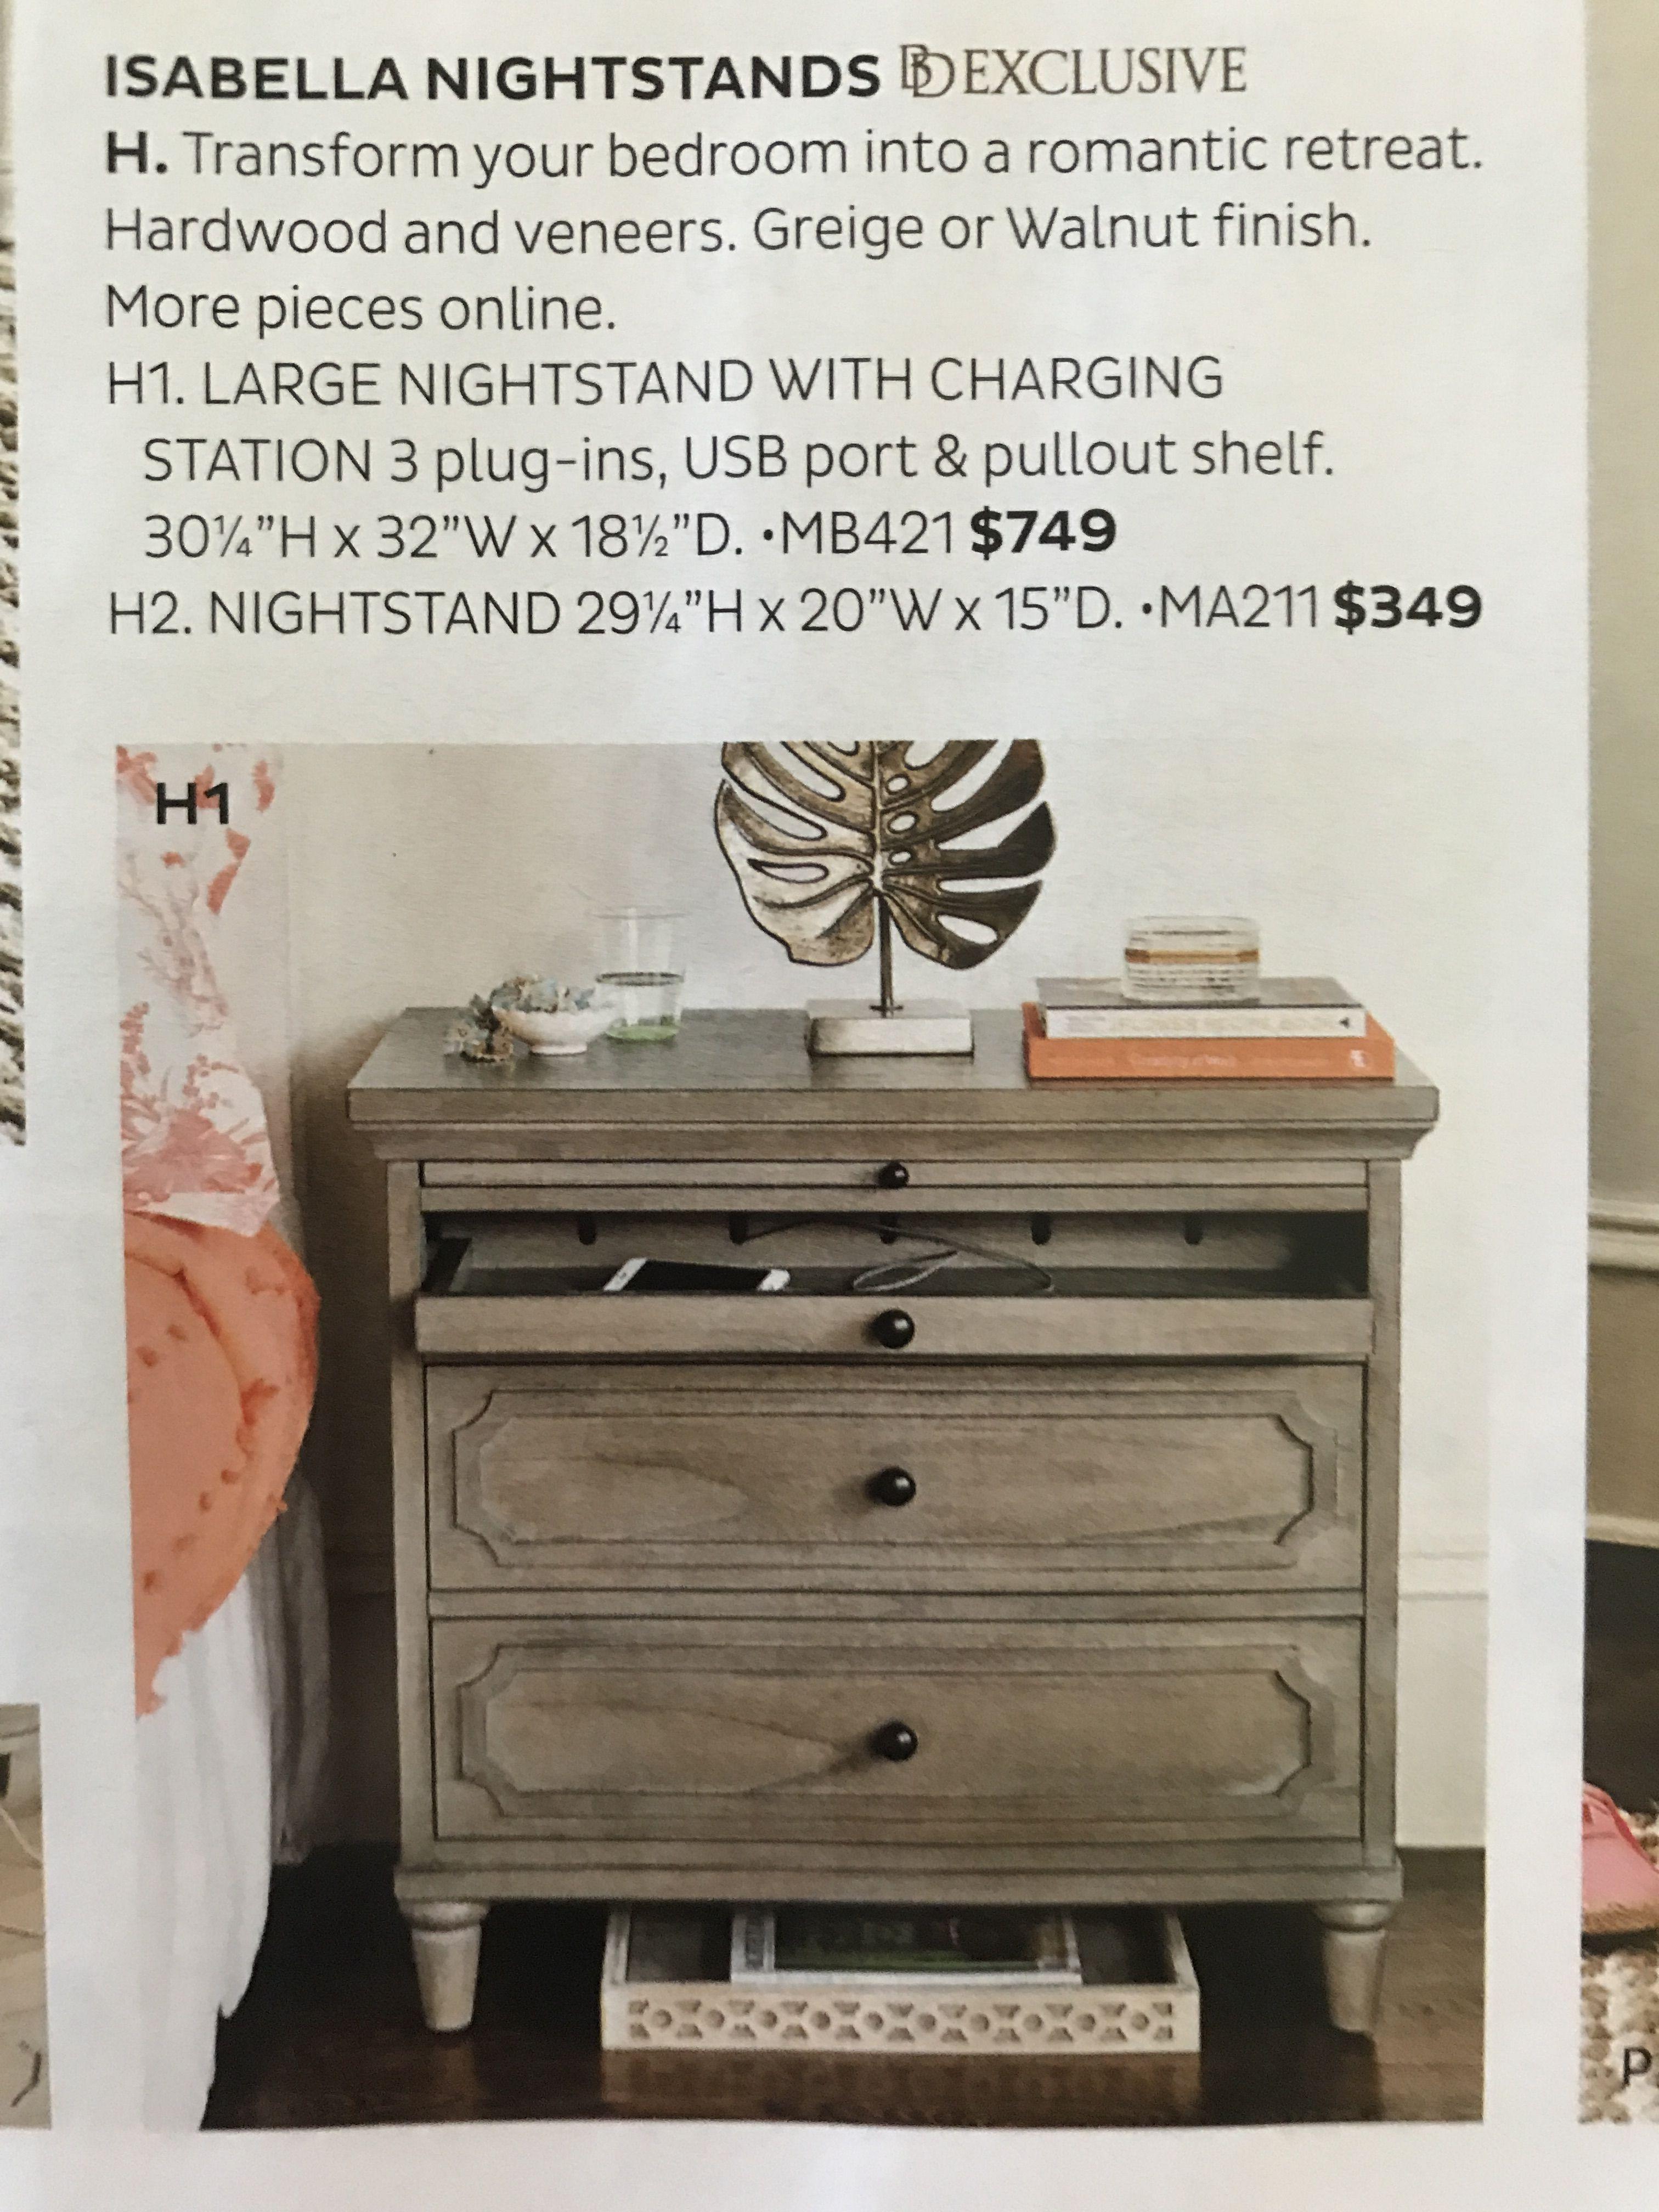 ballard designs isabella nightstand with charging station $749 (no